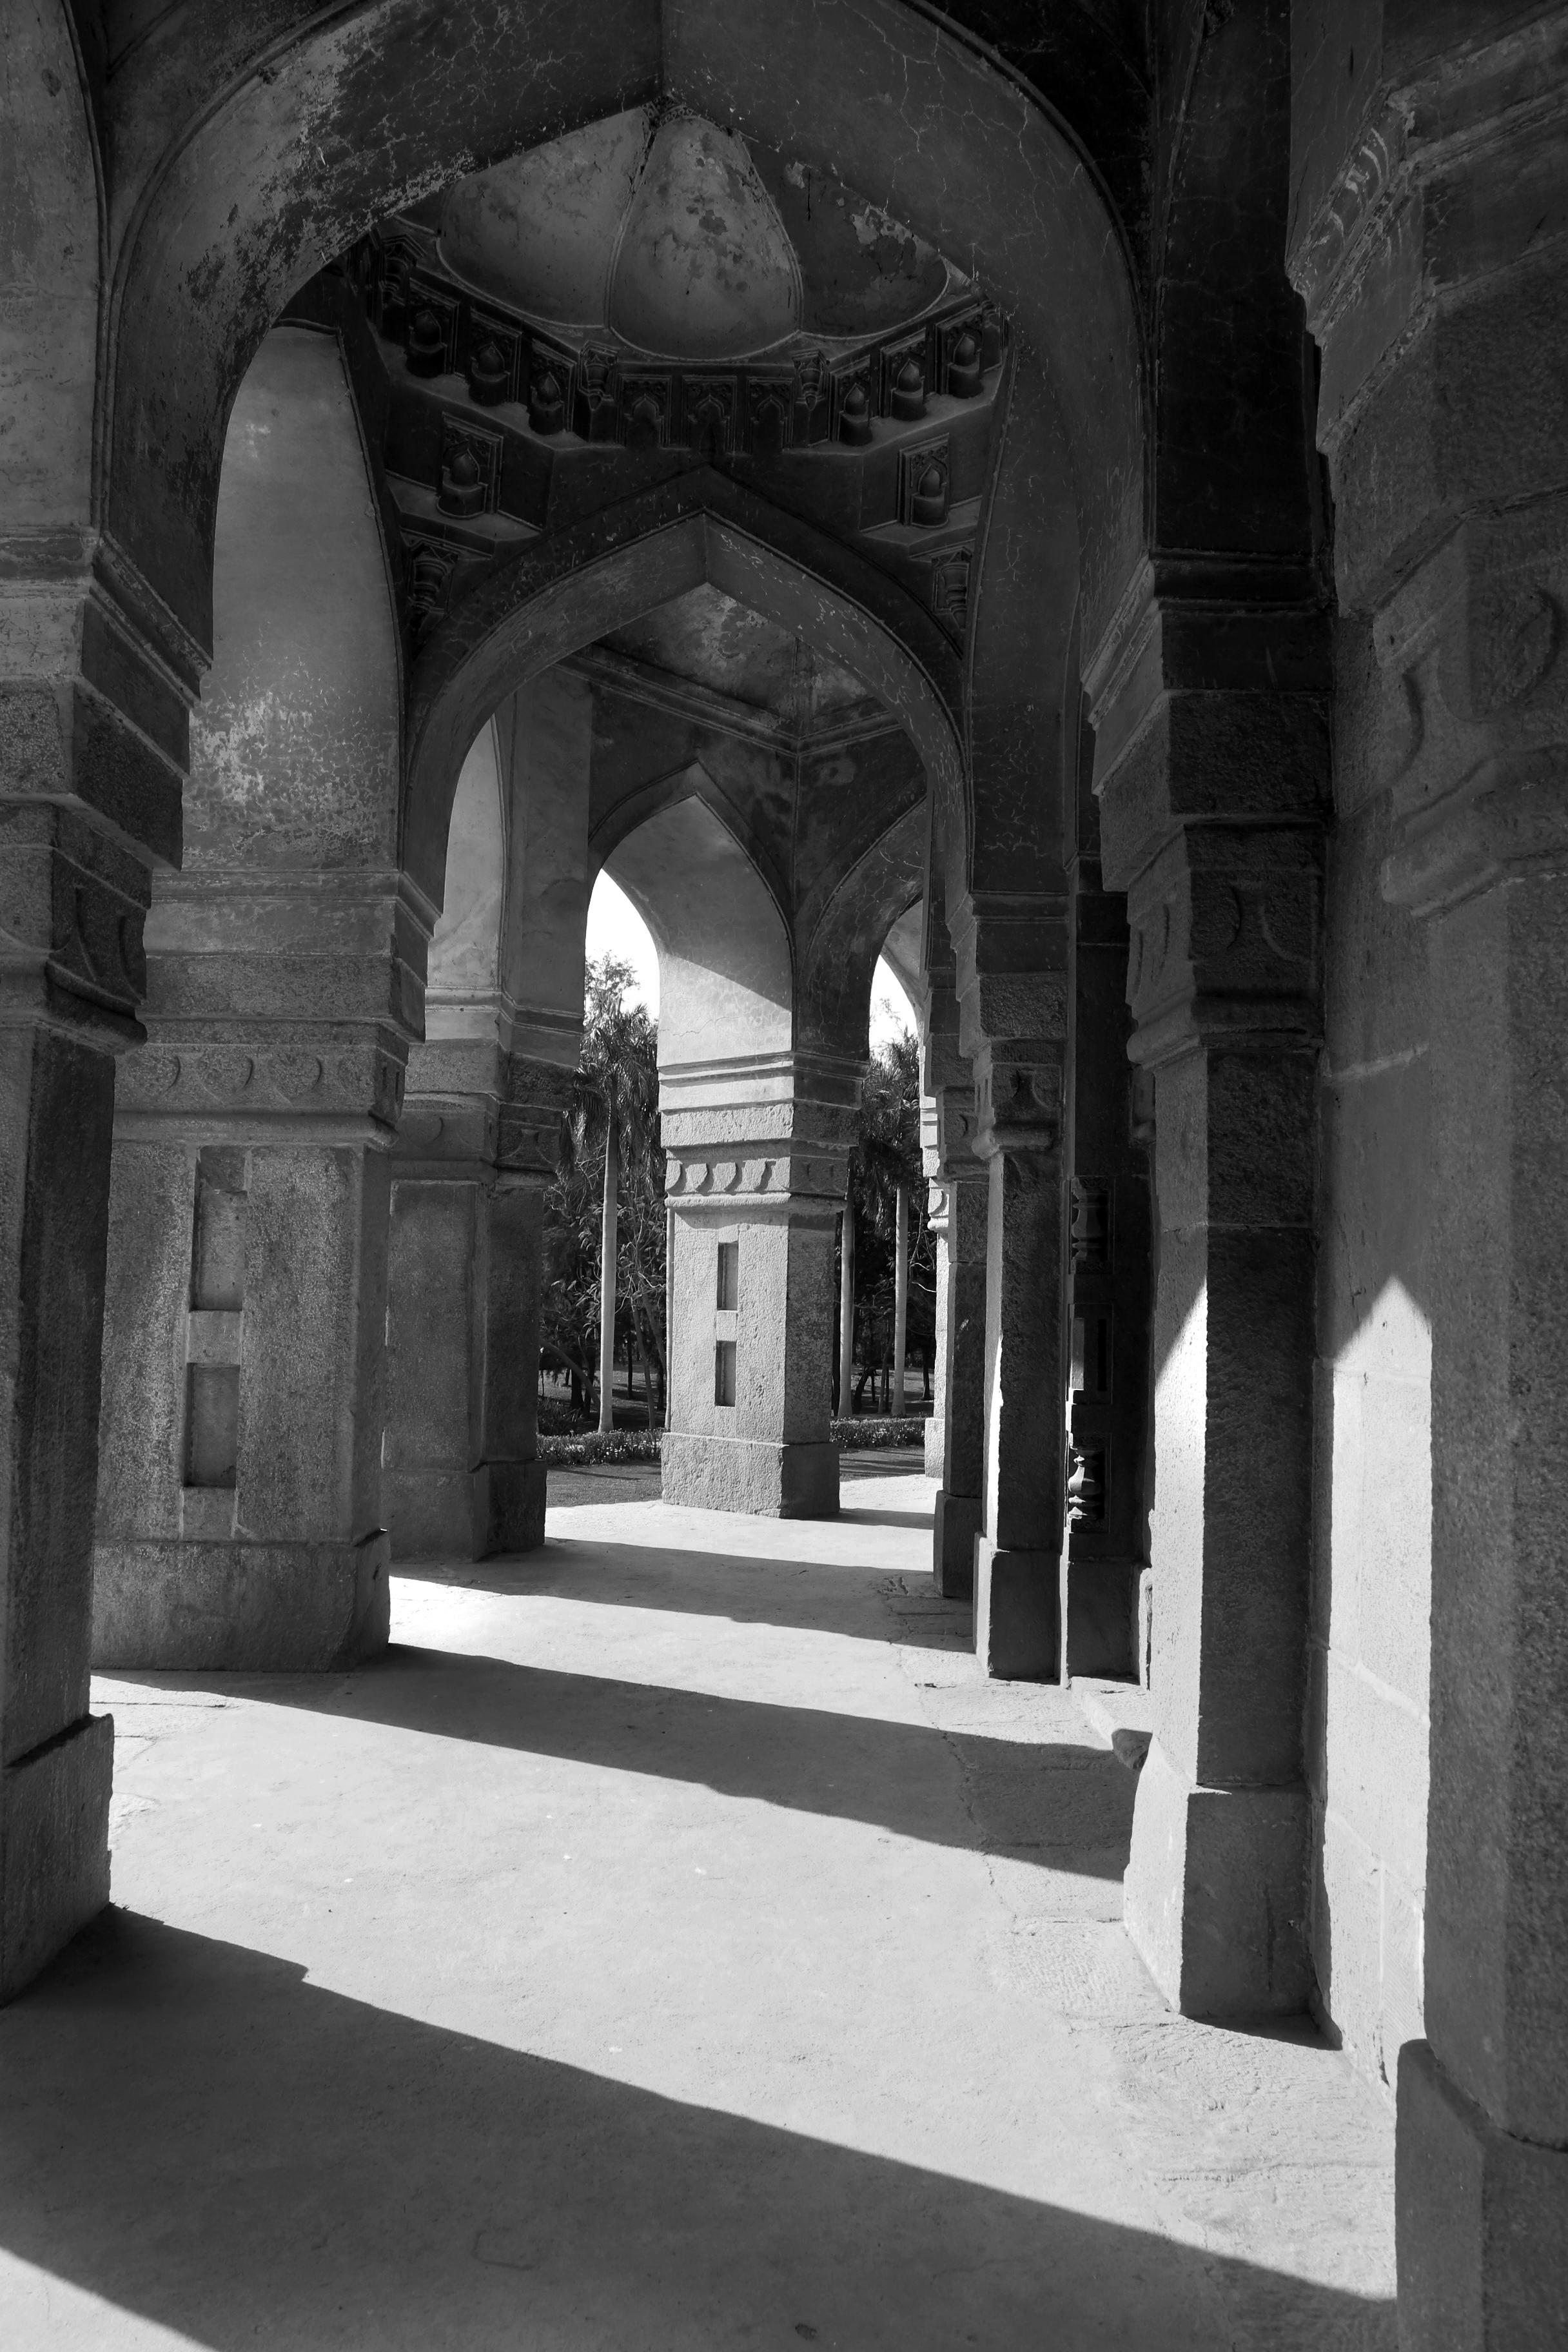 Shadows in Lodhi Gardens